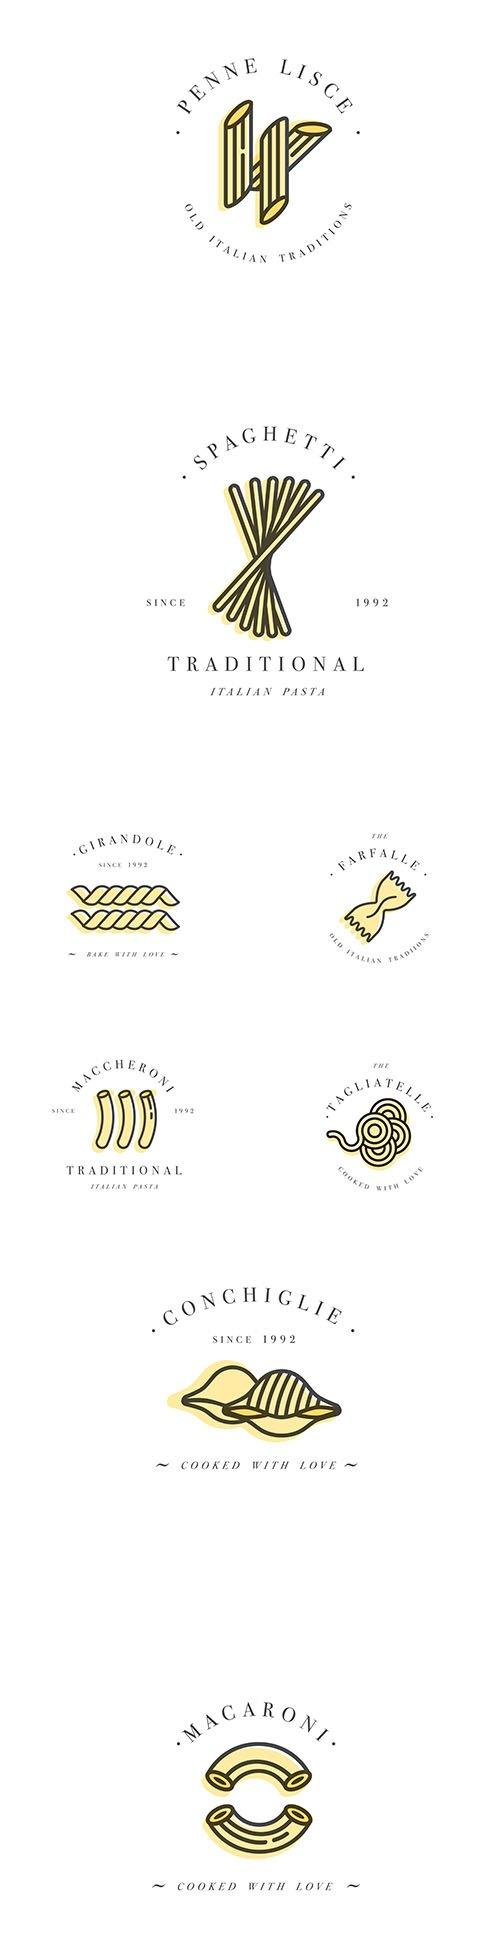 Design Template Emblem Vector Badge Italian Pasta Logos